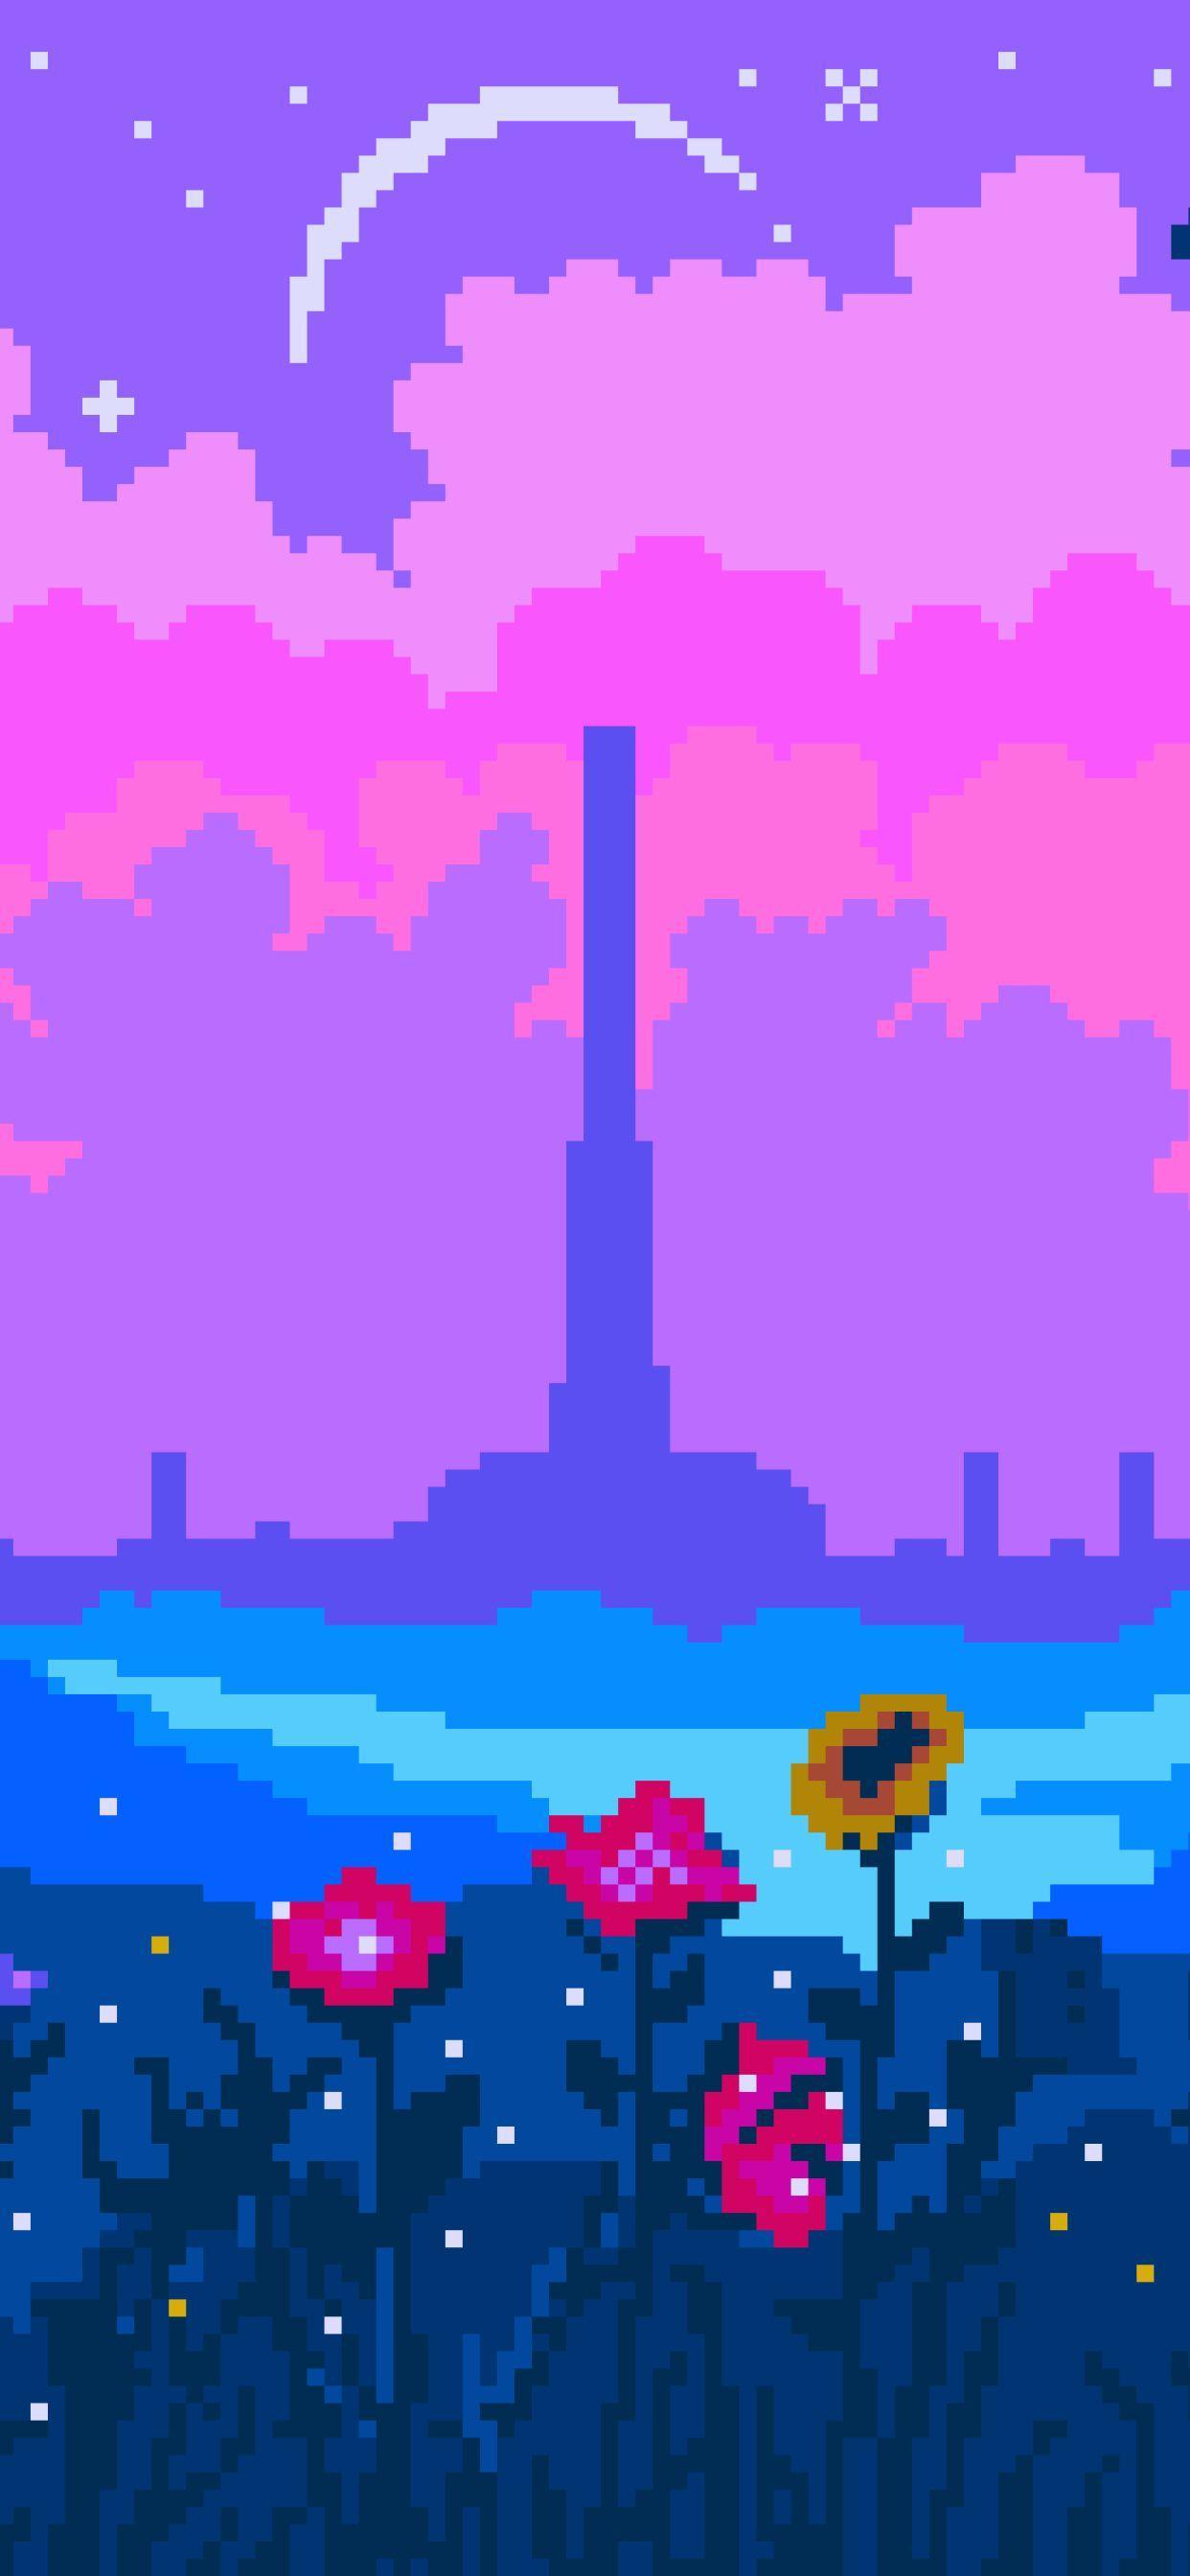 Pixel Art Iphone Wallpapers Top Free Pixel Art Iphone Backgrounds Wallpaperaccess